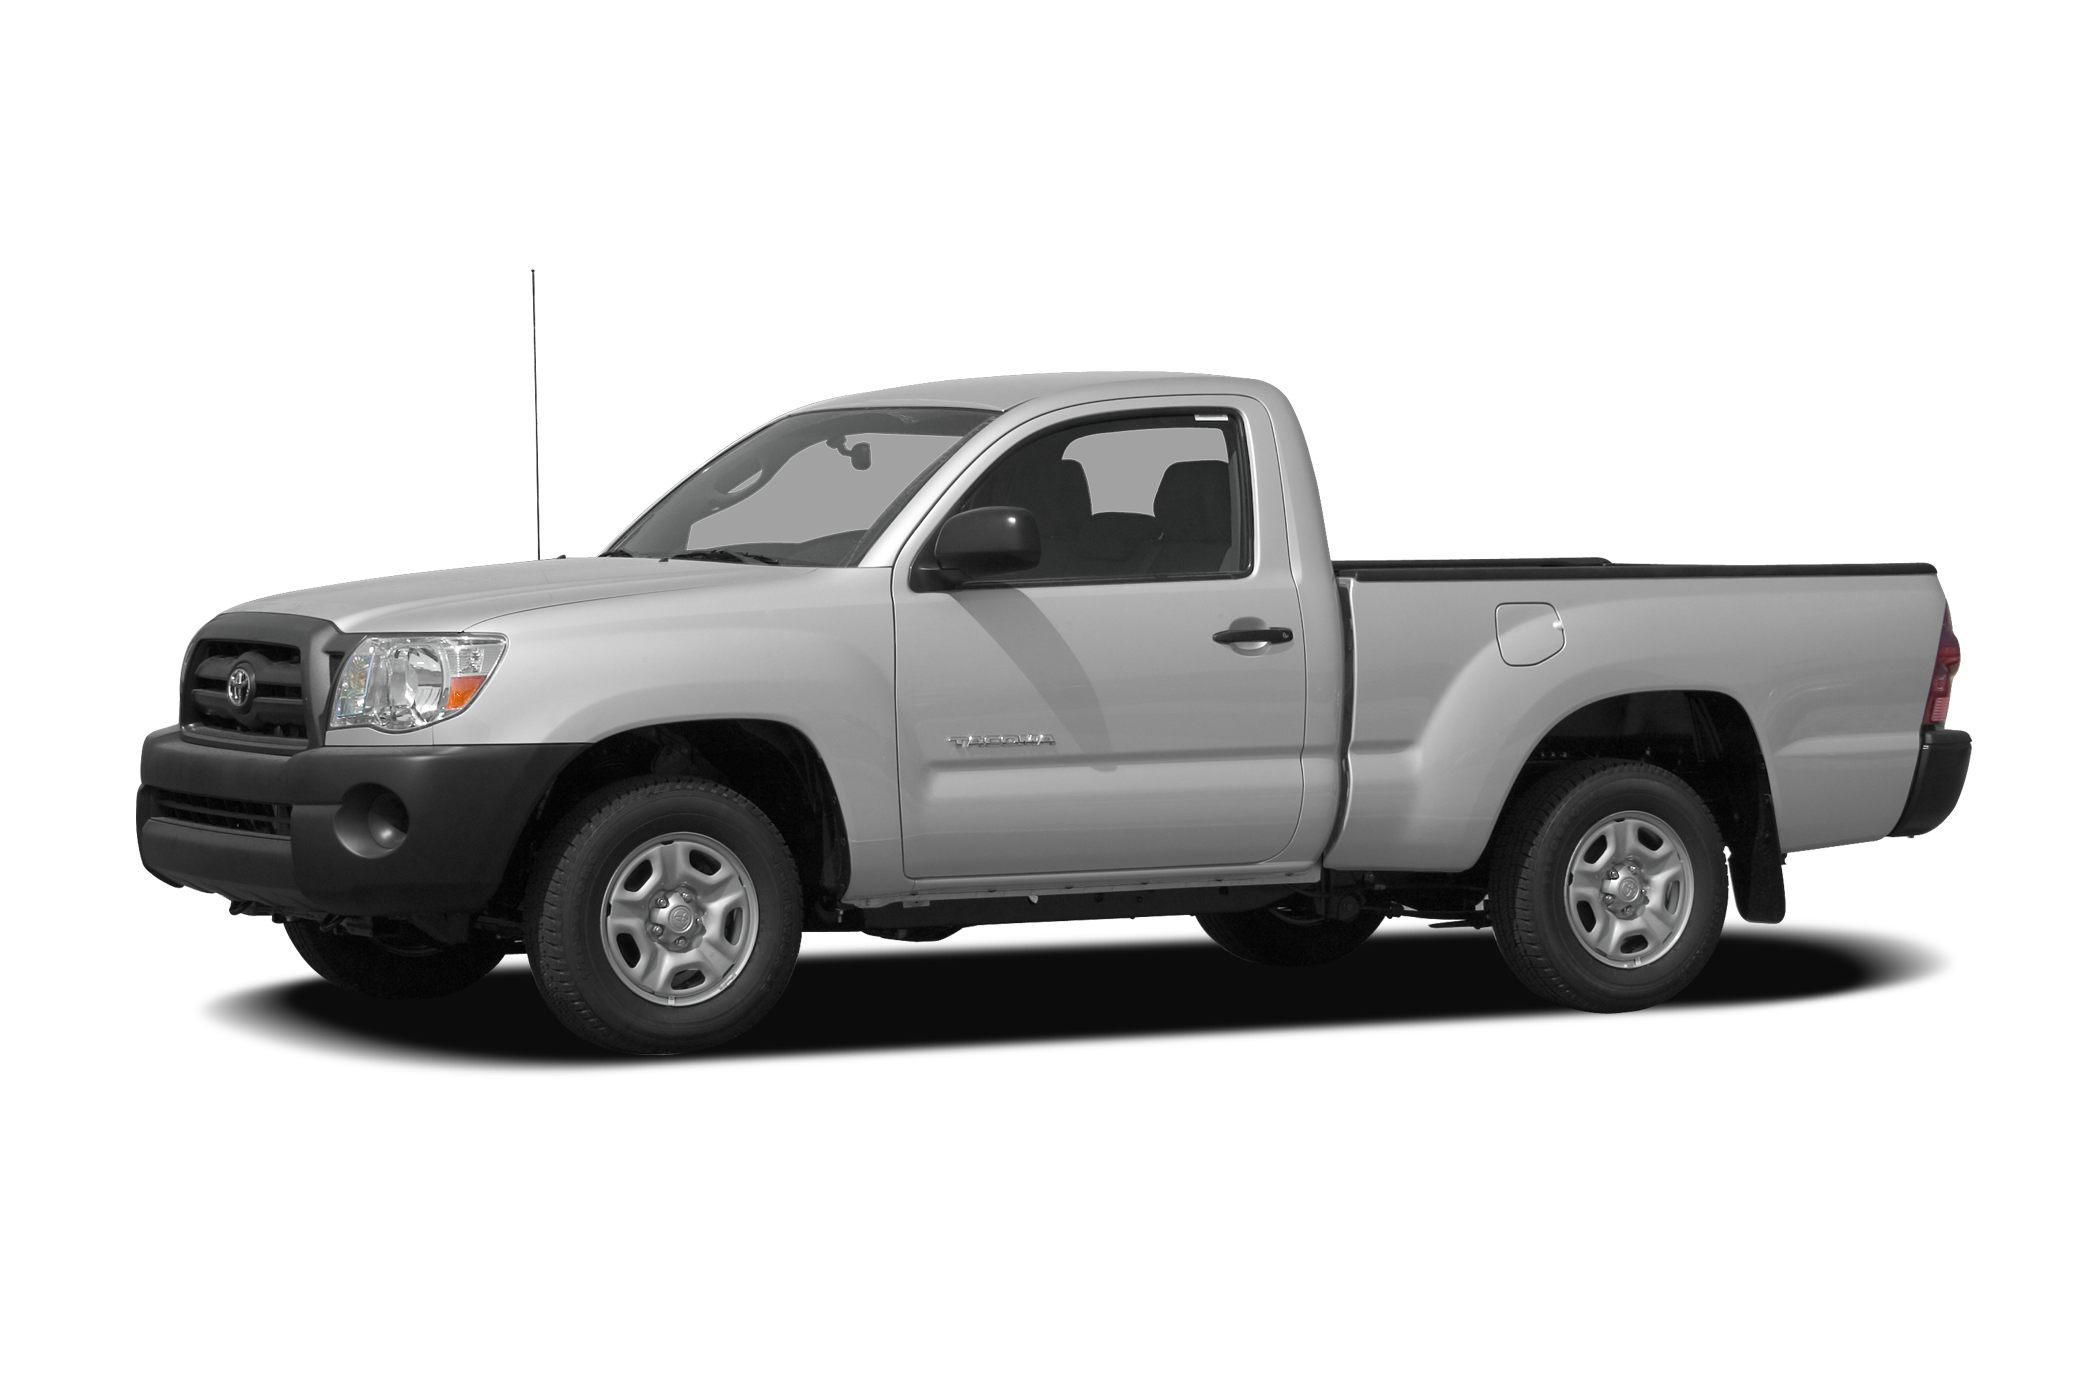 2008 Toyota Tacoma Safety Recalls